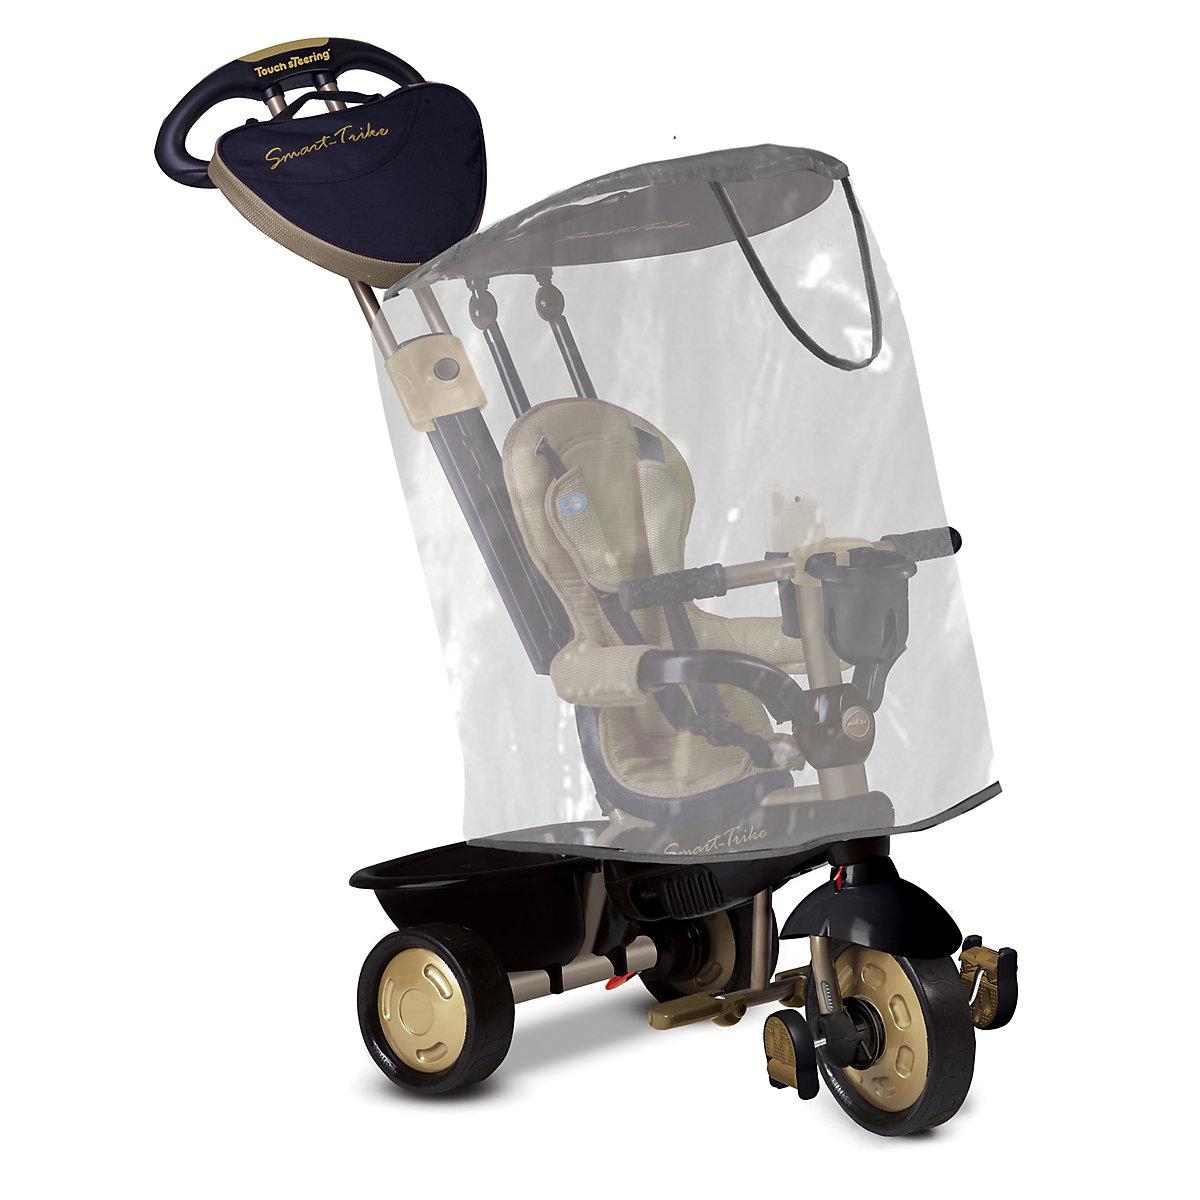 new elc smart trike raincover toy. Black Bedroom Furniture Sets. Home Design Ideas